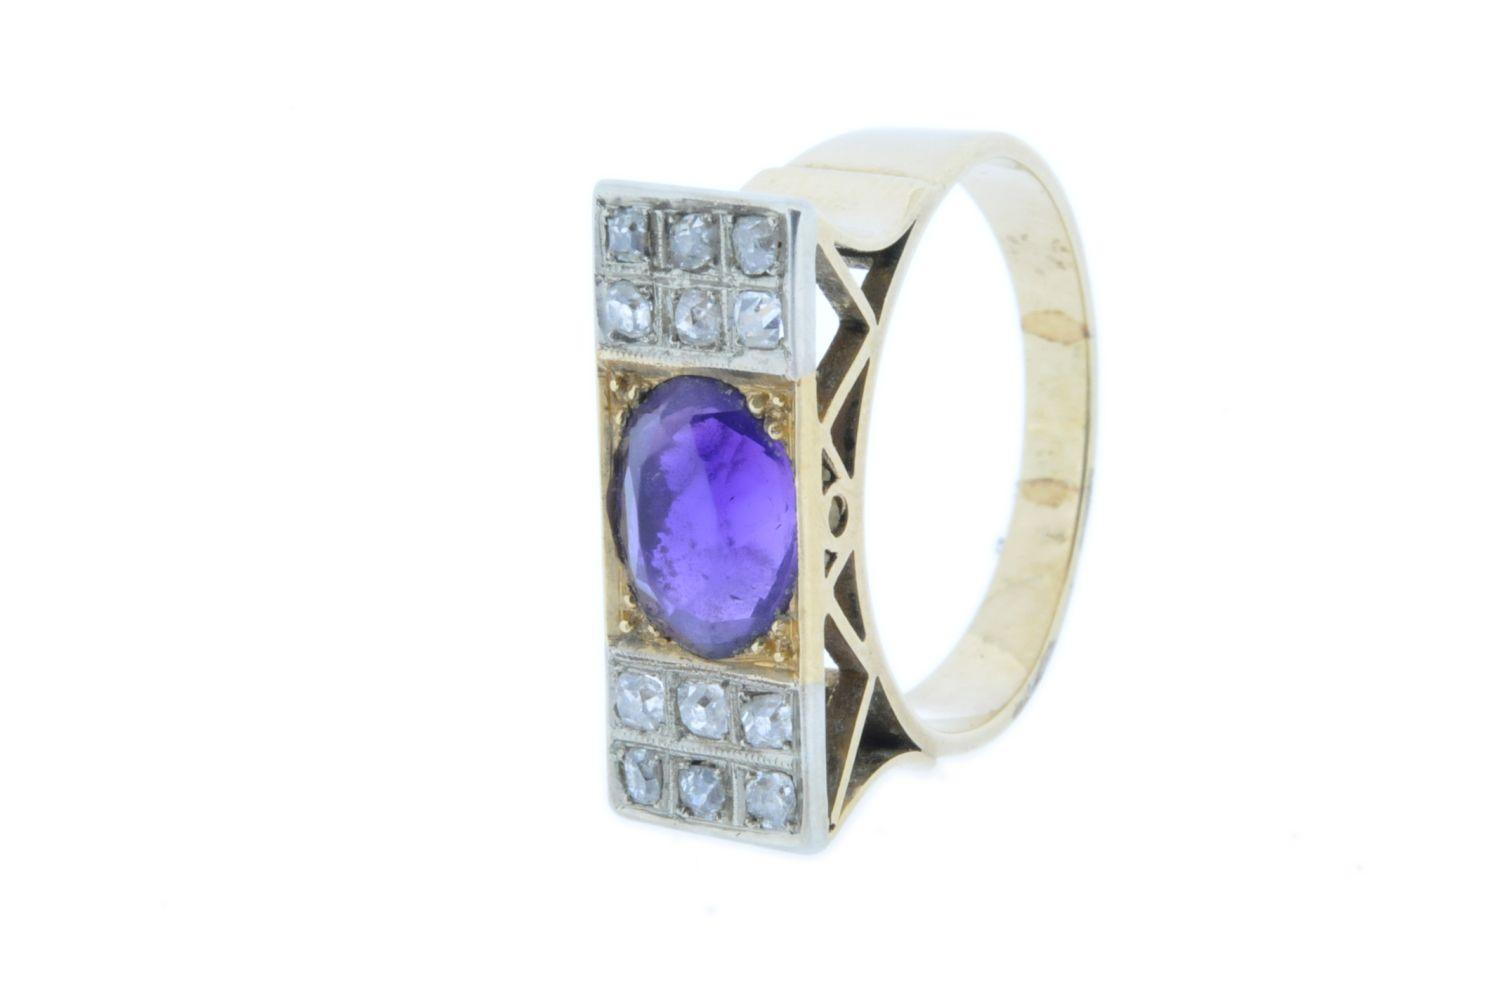 #51 Vintage Ring | Vintage Ring Image